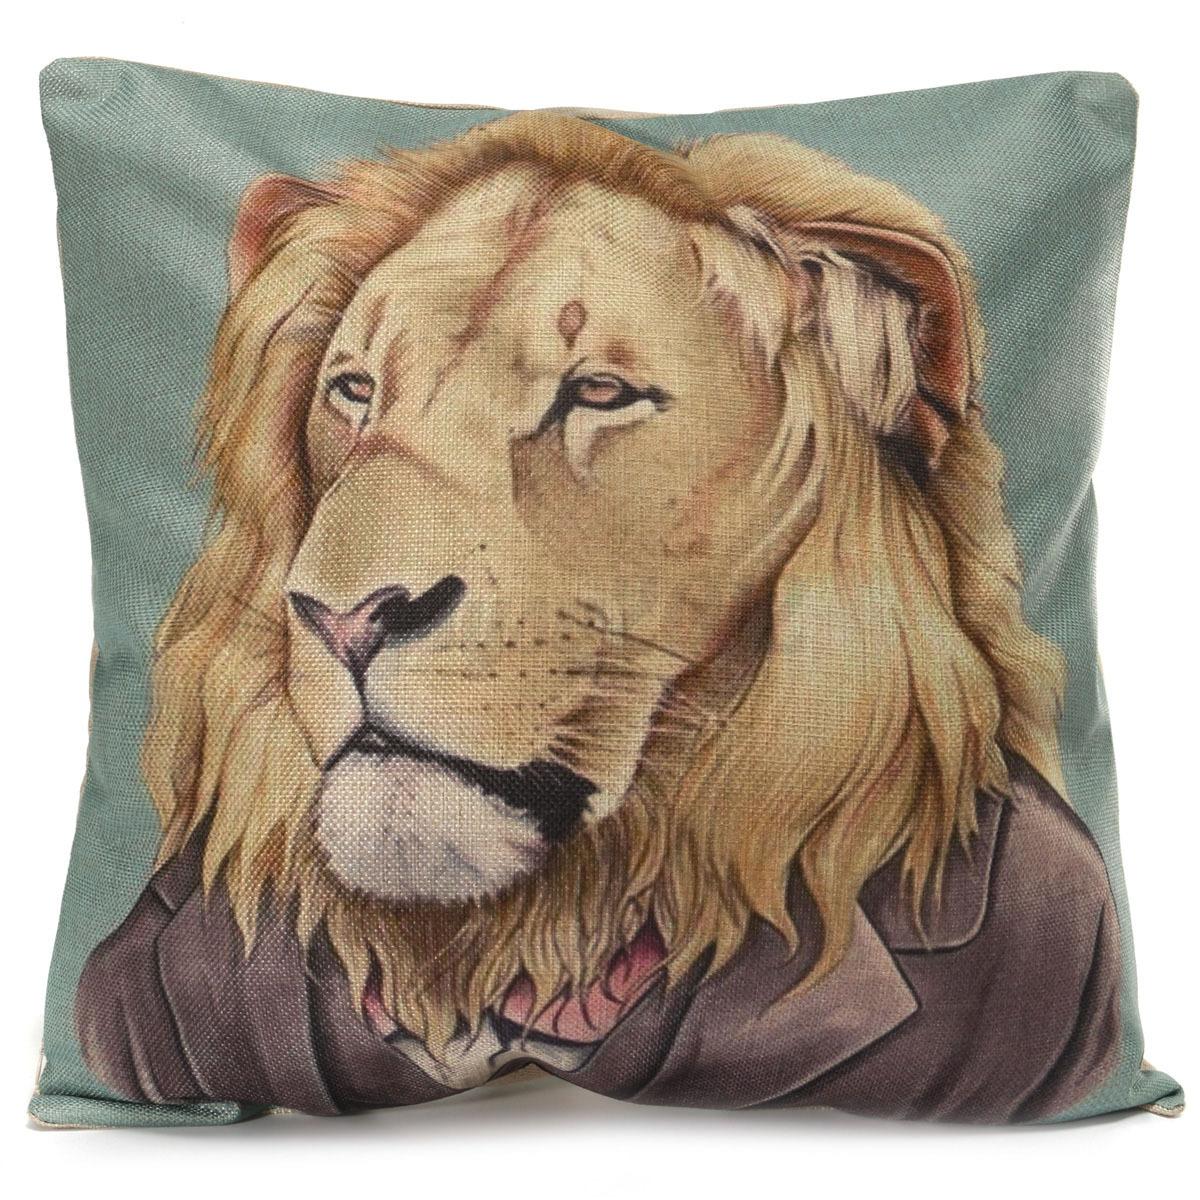 Animal CAT DOG Koala Penguin Tiger Cushion Cover Home CAR Decor Pillow Case NEW eBay